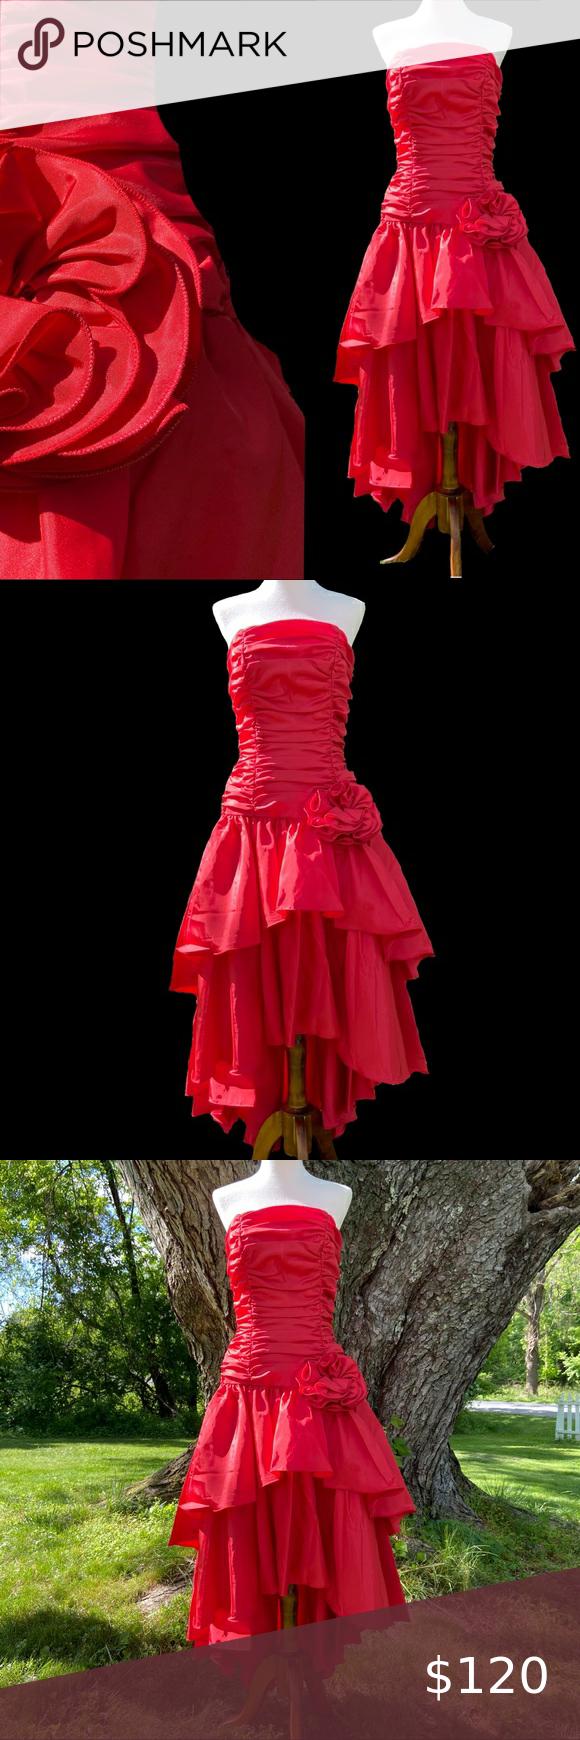 Vintage 80s Prom Dress Red Small Red Prom Dress 80s Prom Dress Red Dress [ 1740 x 580 Pixel ]